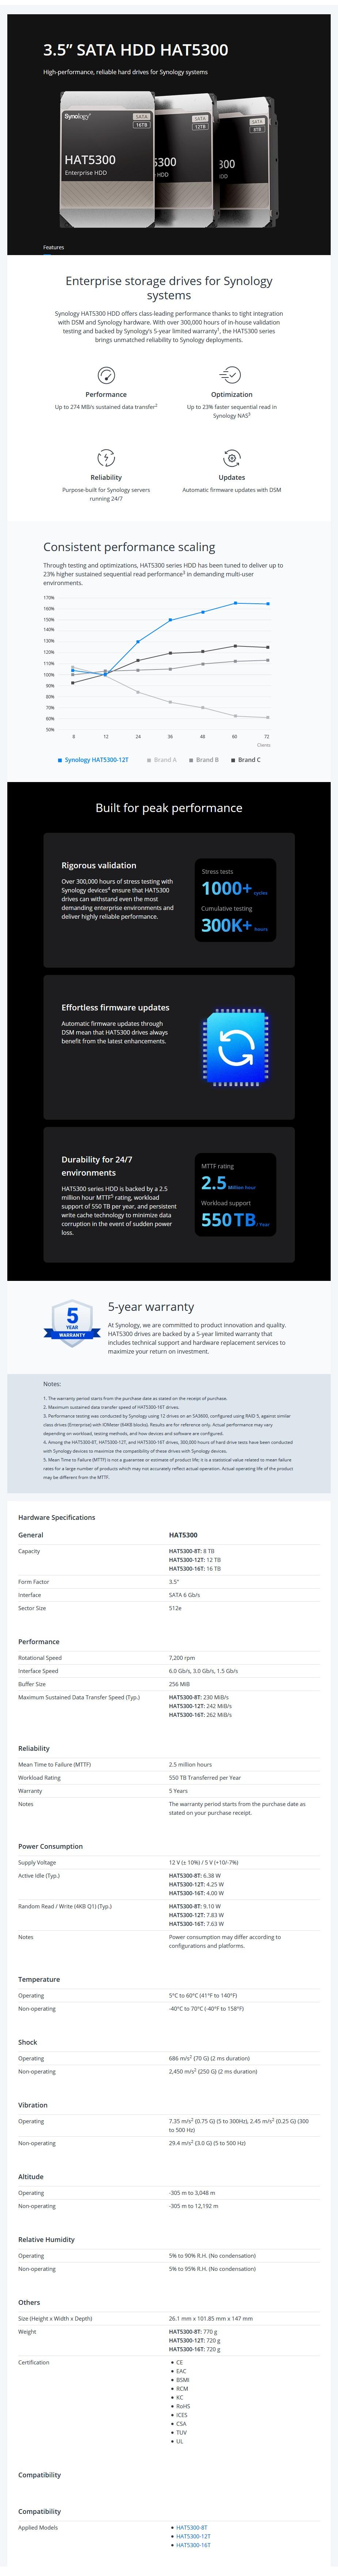 synology-hat5300-8tb-35-sata-6gbs-512e-7200rpm-enterprise-server-hard-drive-ac42639-1.jpg